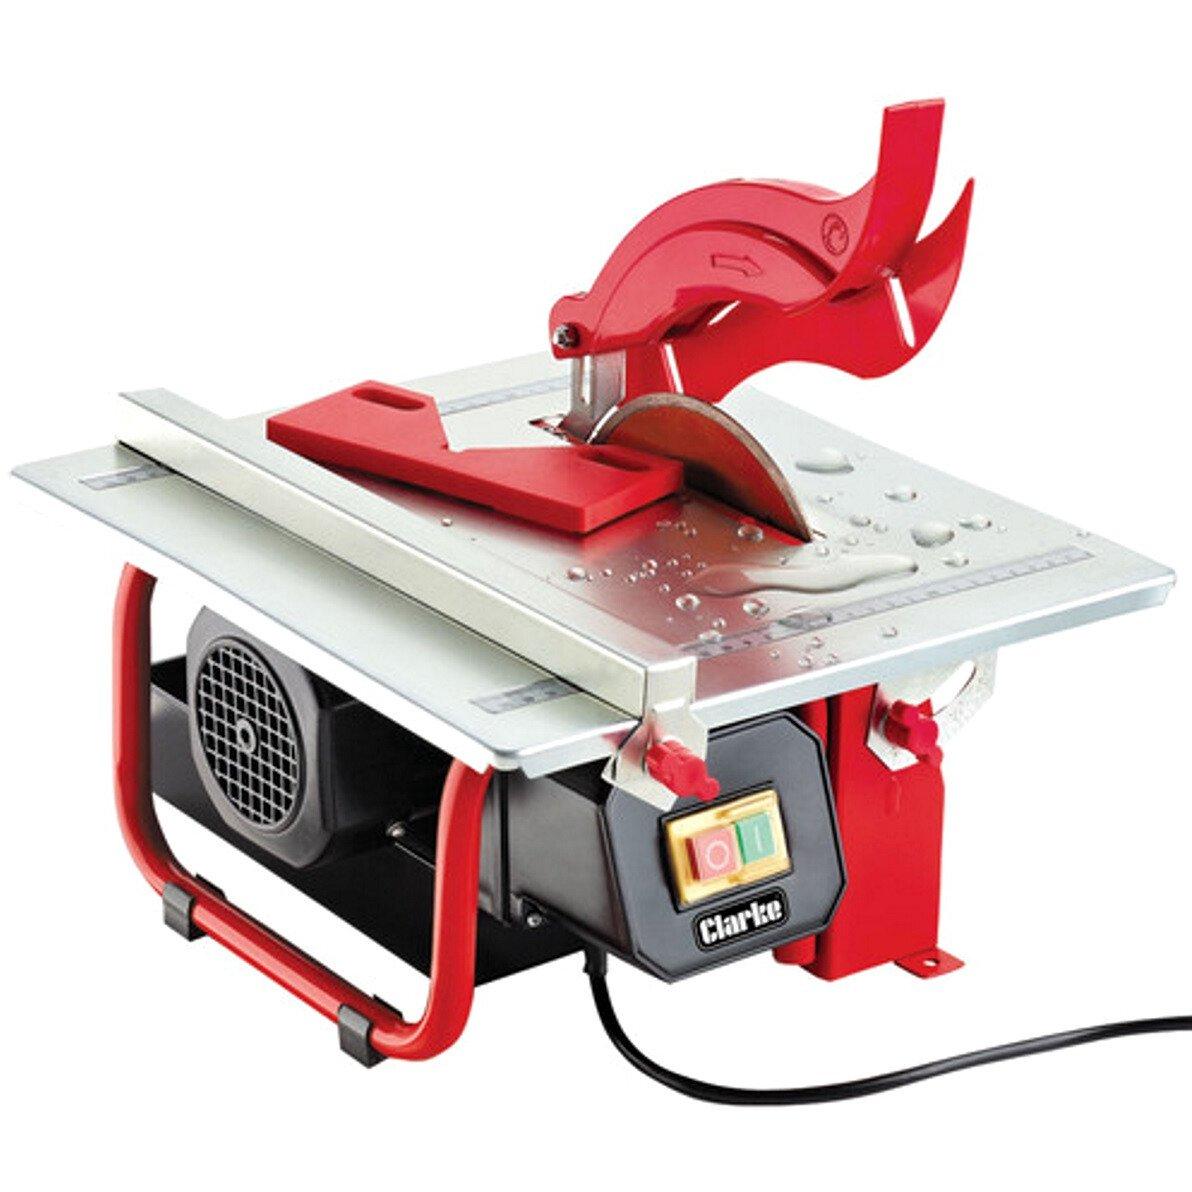 Clarke ETC8 450W Electric Tile Cutter 230v 3400515